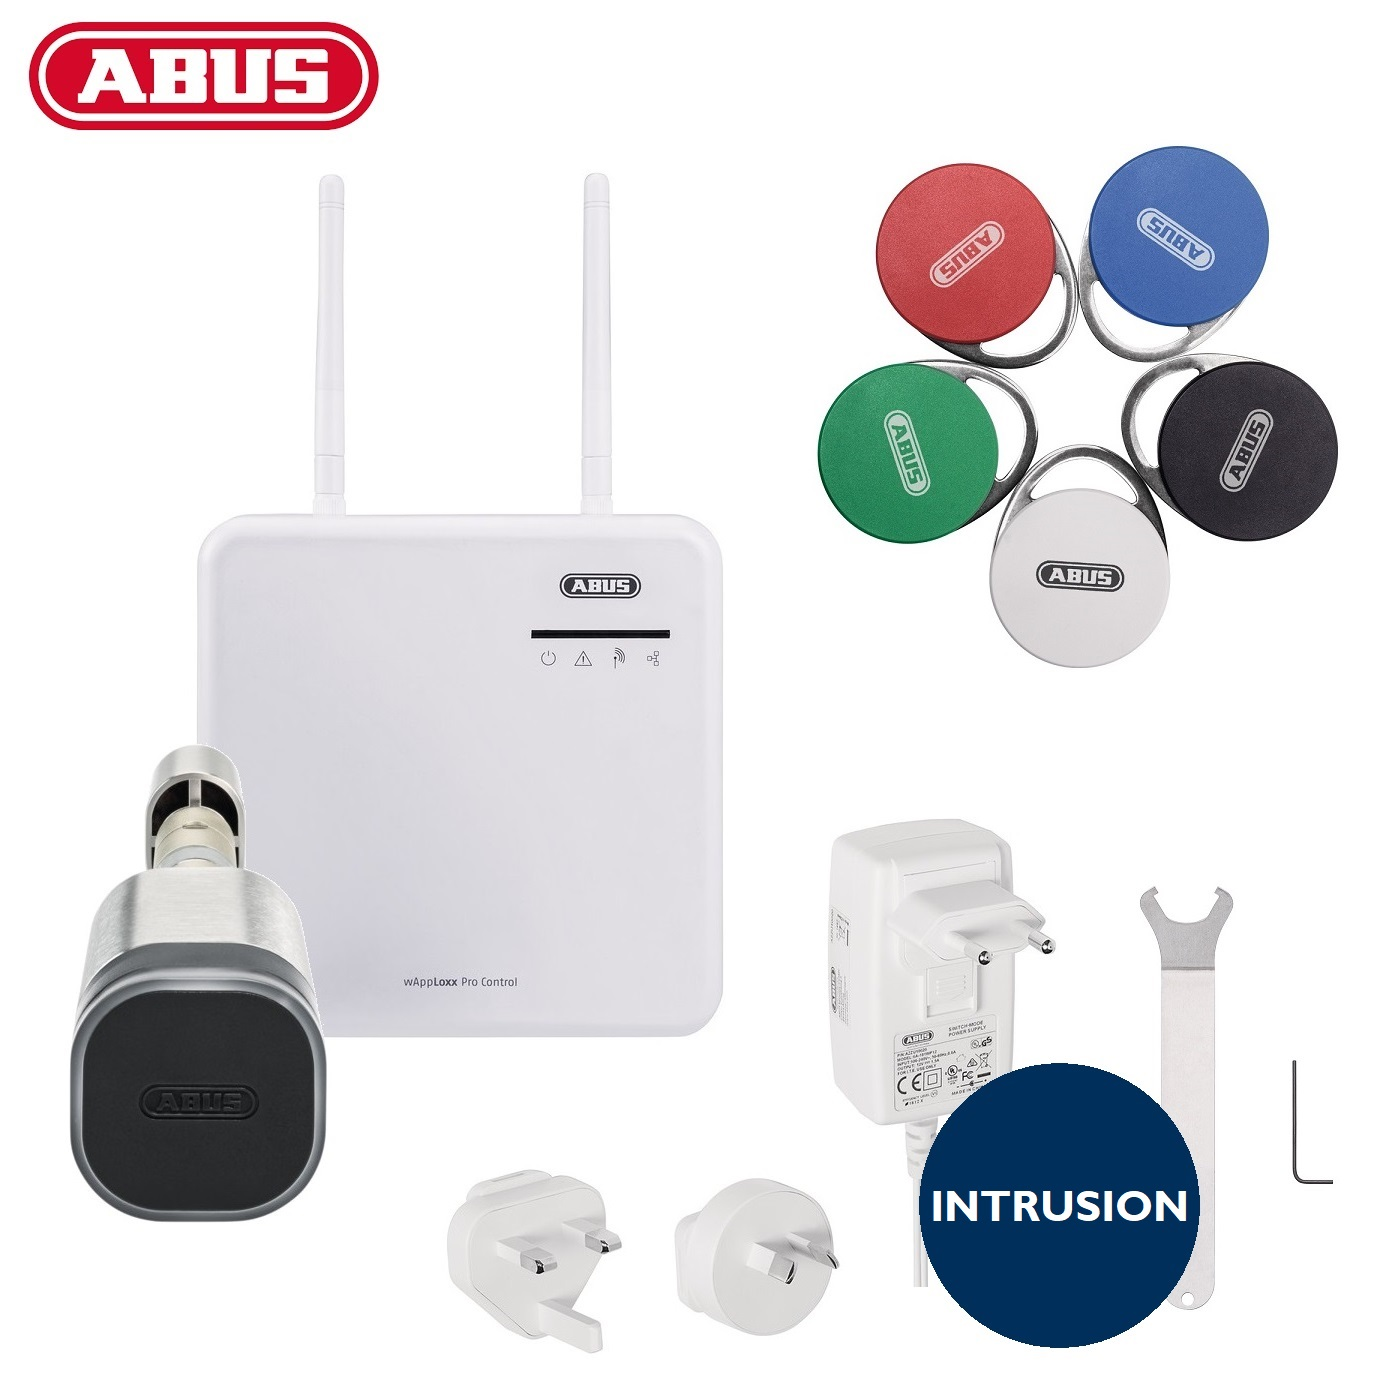 ABUS WLX Pro Starterkit Intrusion schwarz